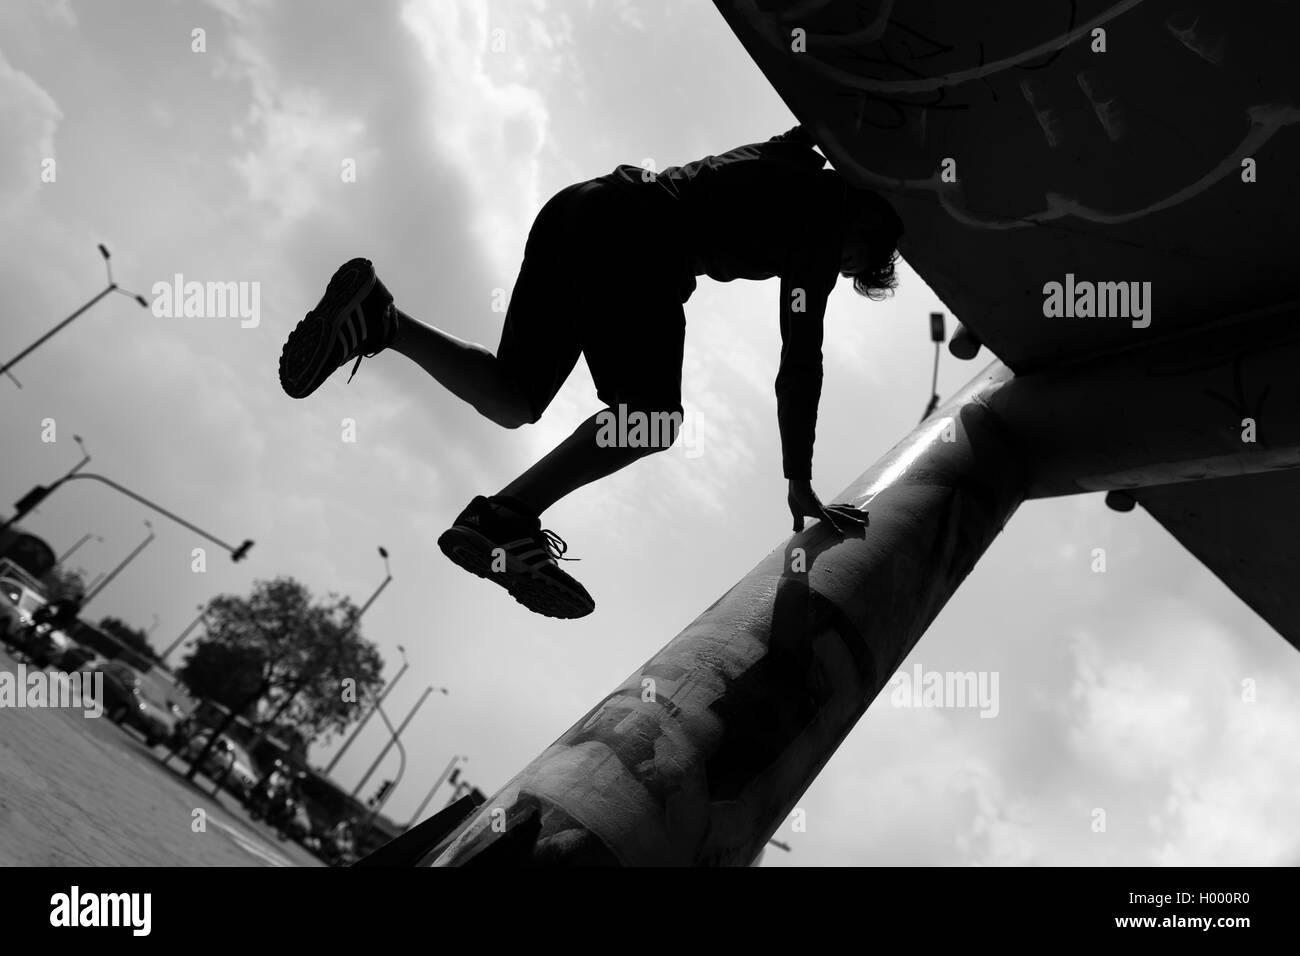 Steven Mantilla, un freerunner de Tamashikaze equipo, realiza el parkour se mueve en la pasarela columna en Bogotá, Imagen De Stock